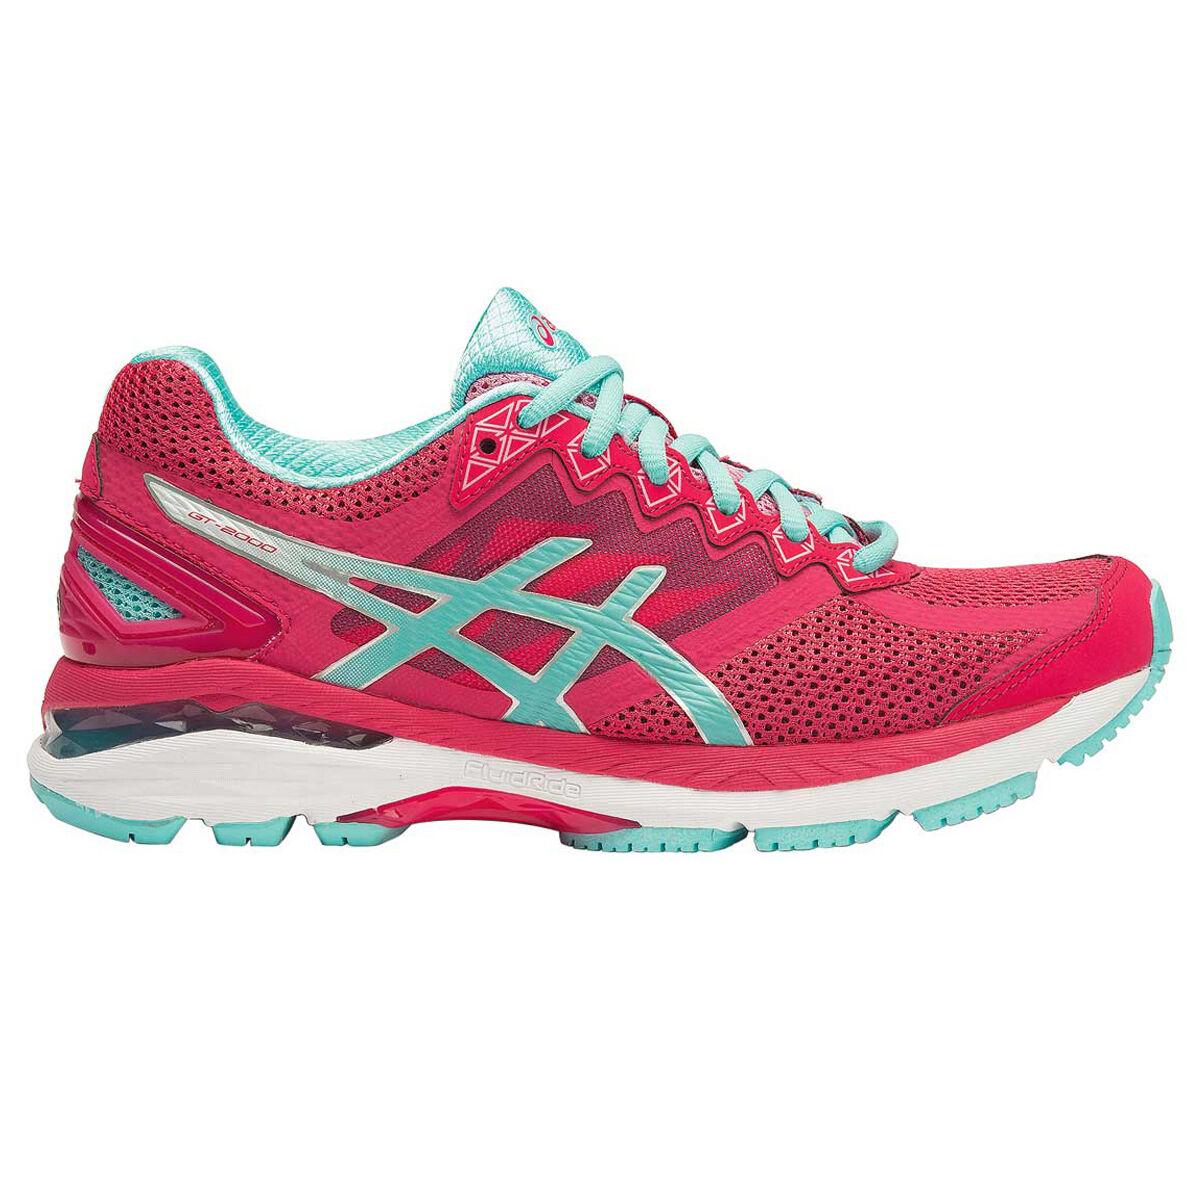 bc464a77b843 ebay asics running shoes pink blue 722fb 87d39